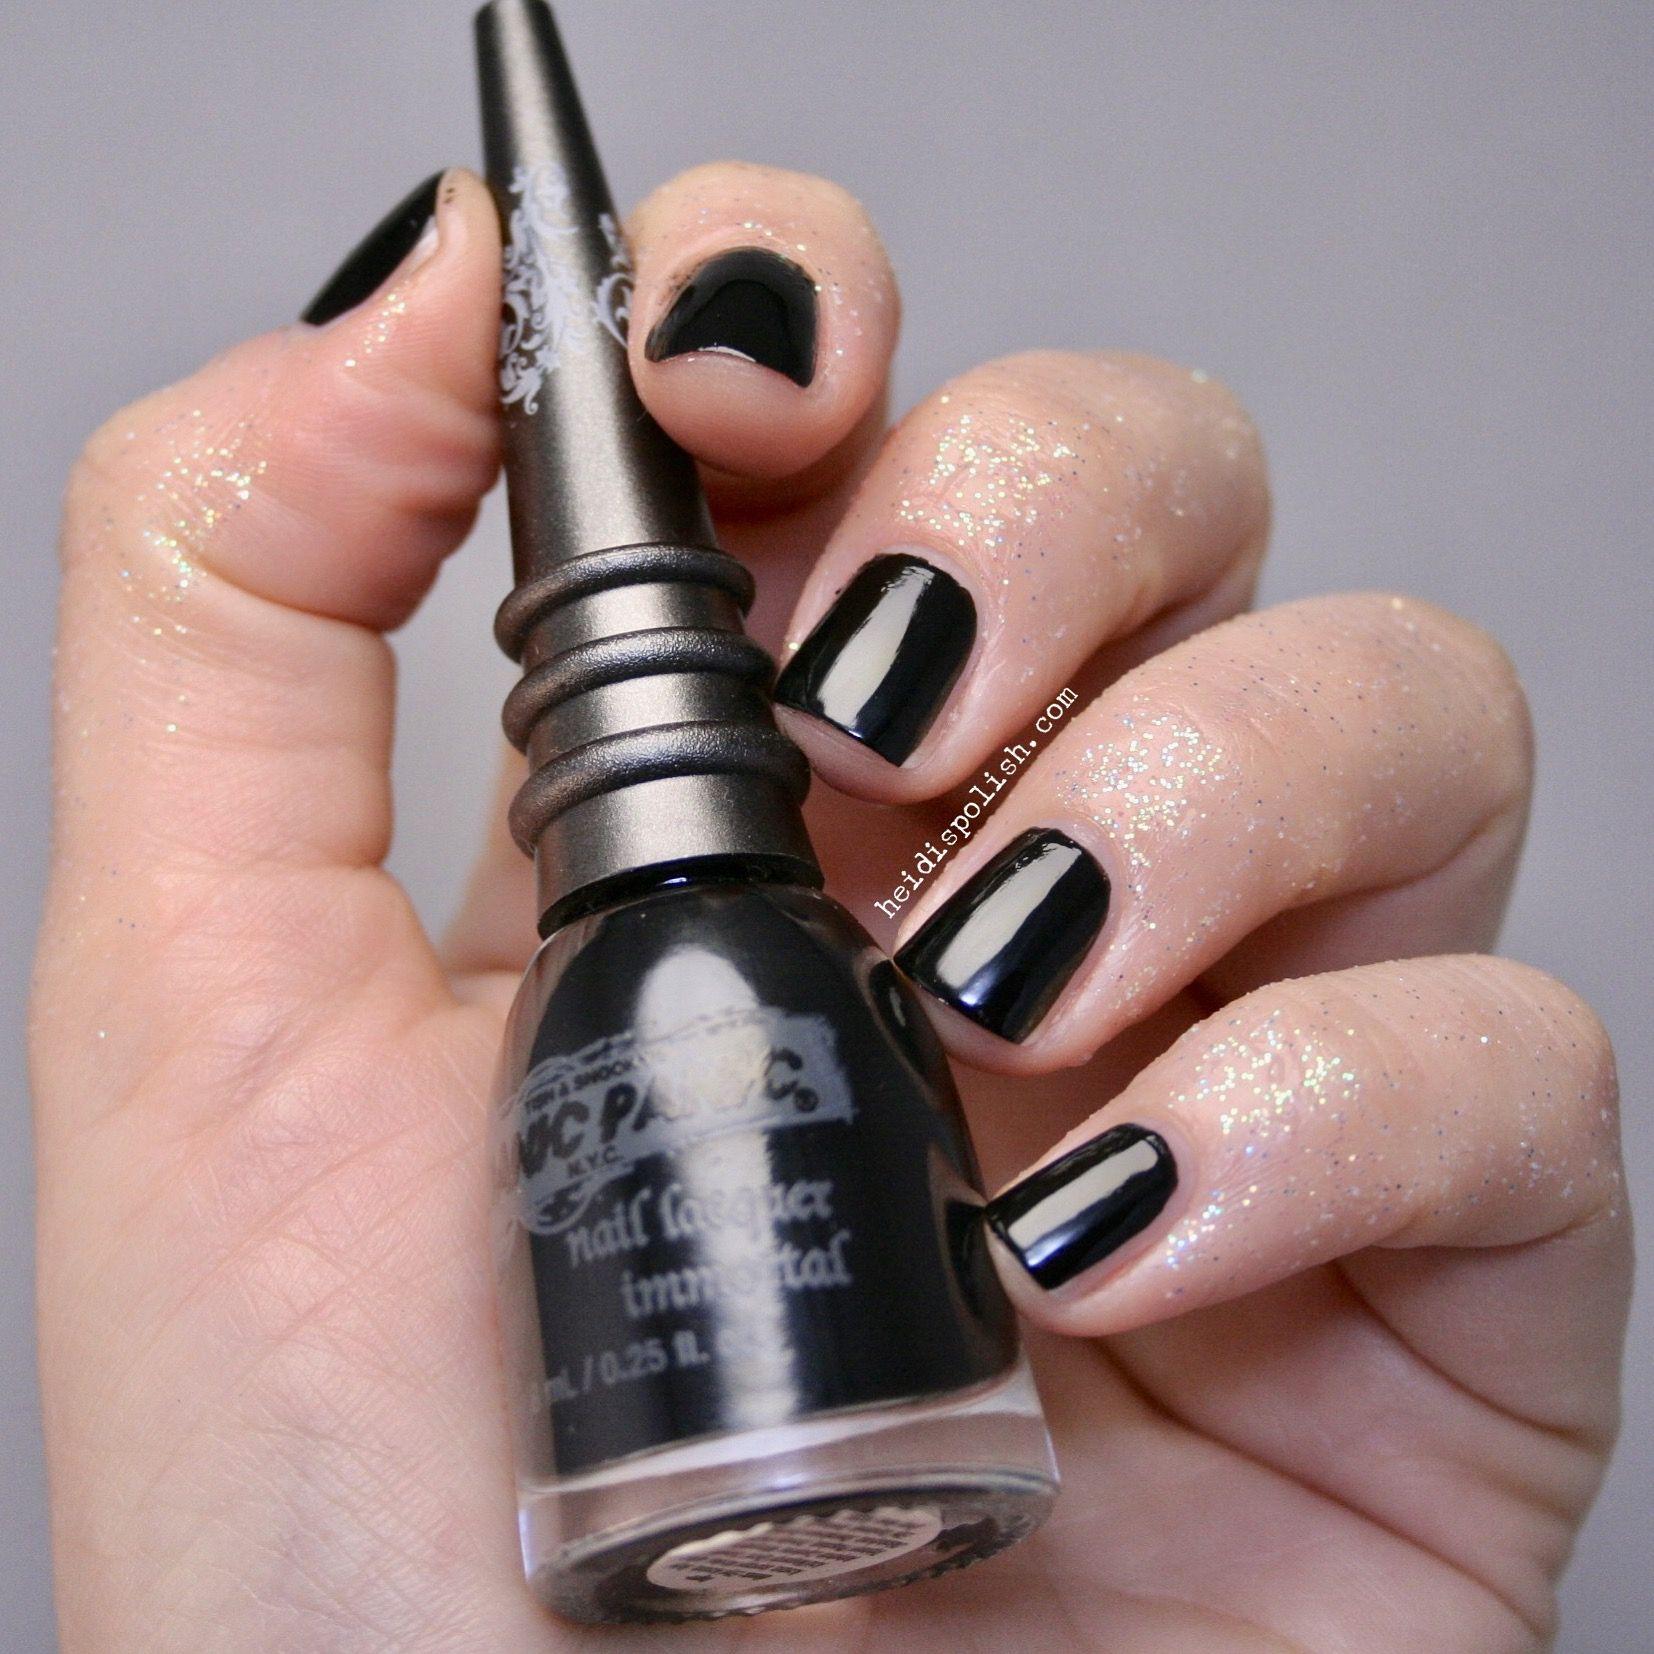 Manic Panic NY nail polish in Black by www.heidispolish.com ...